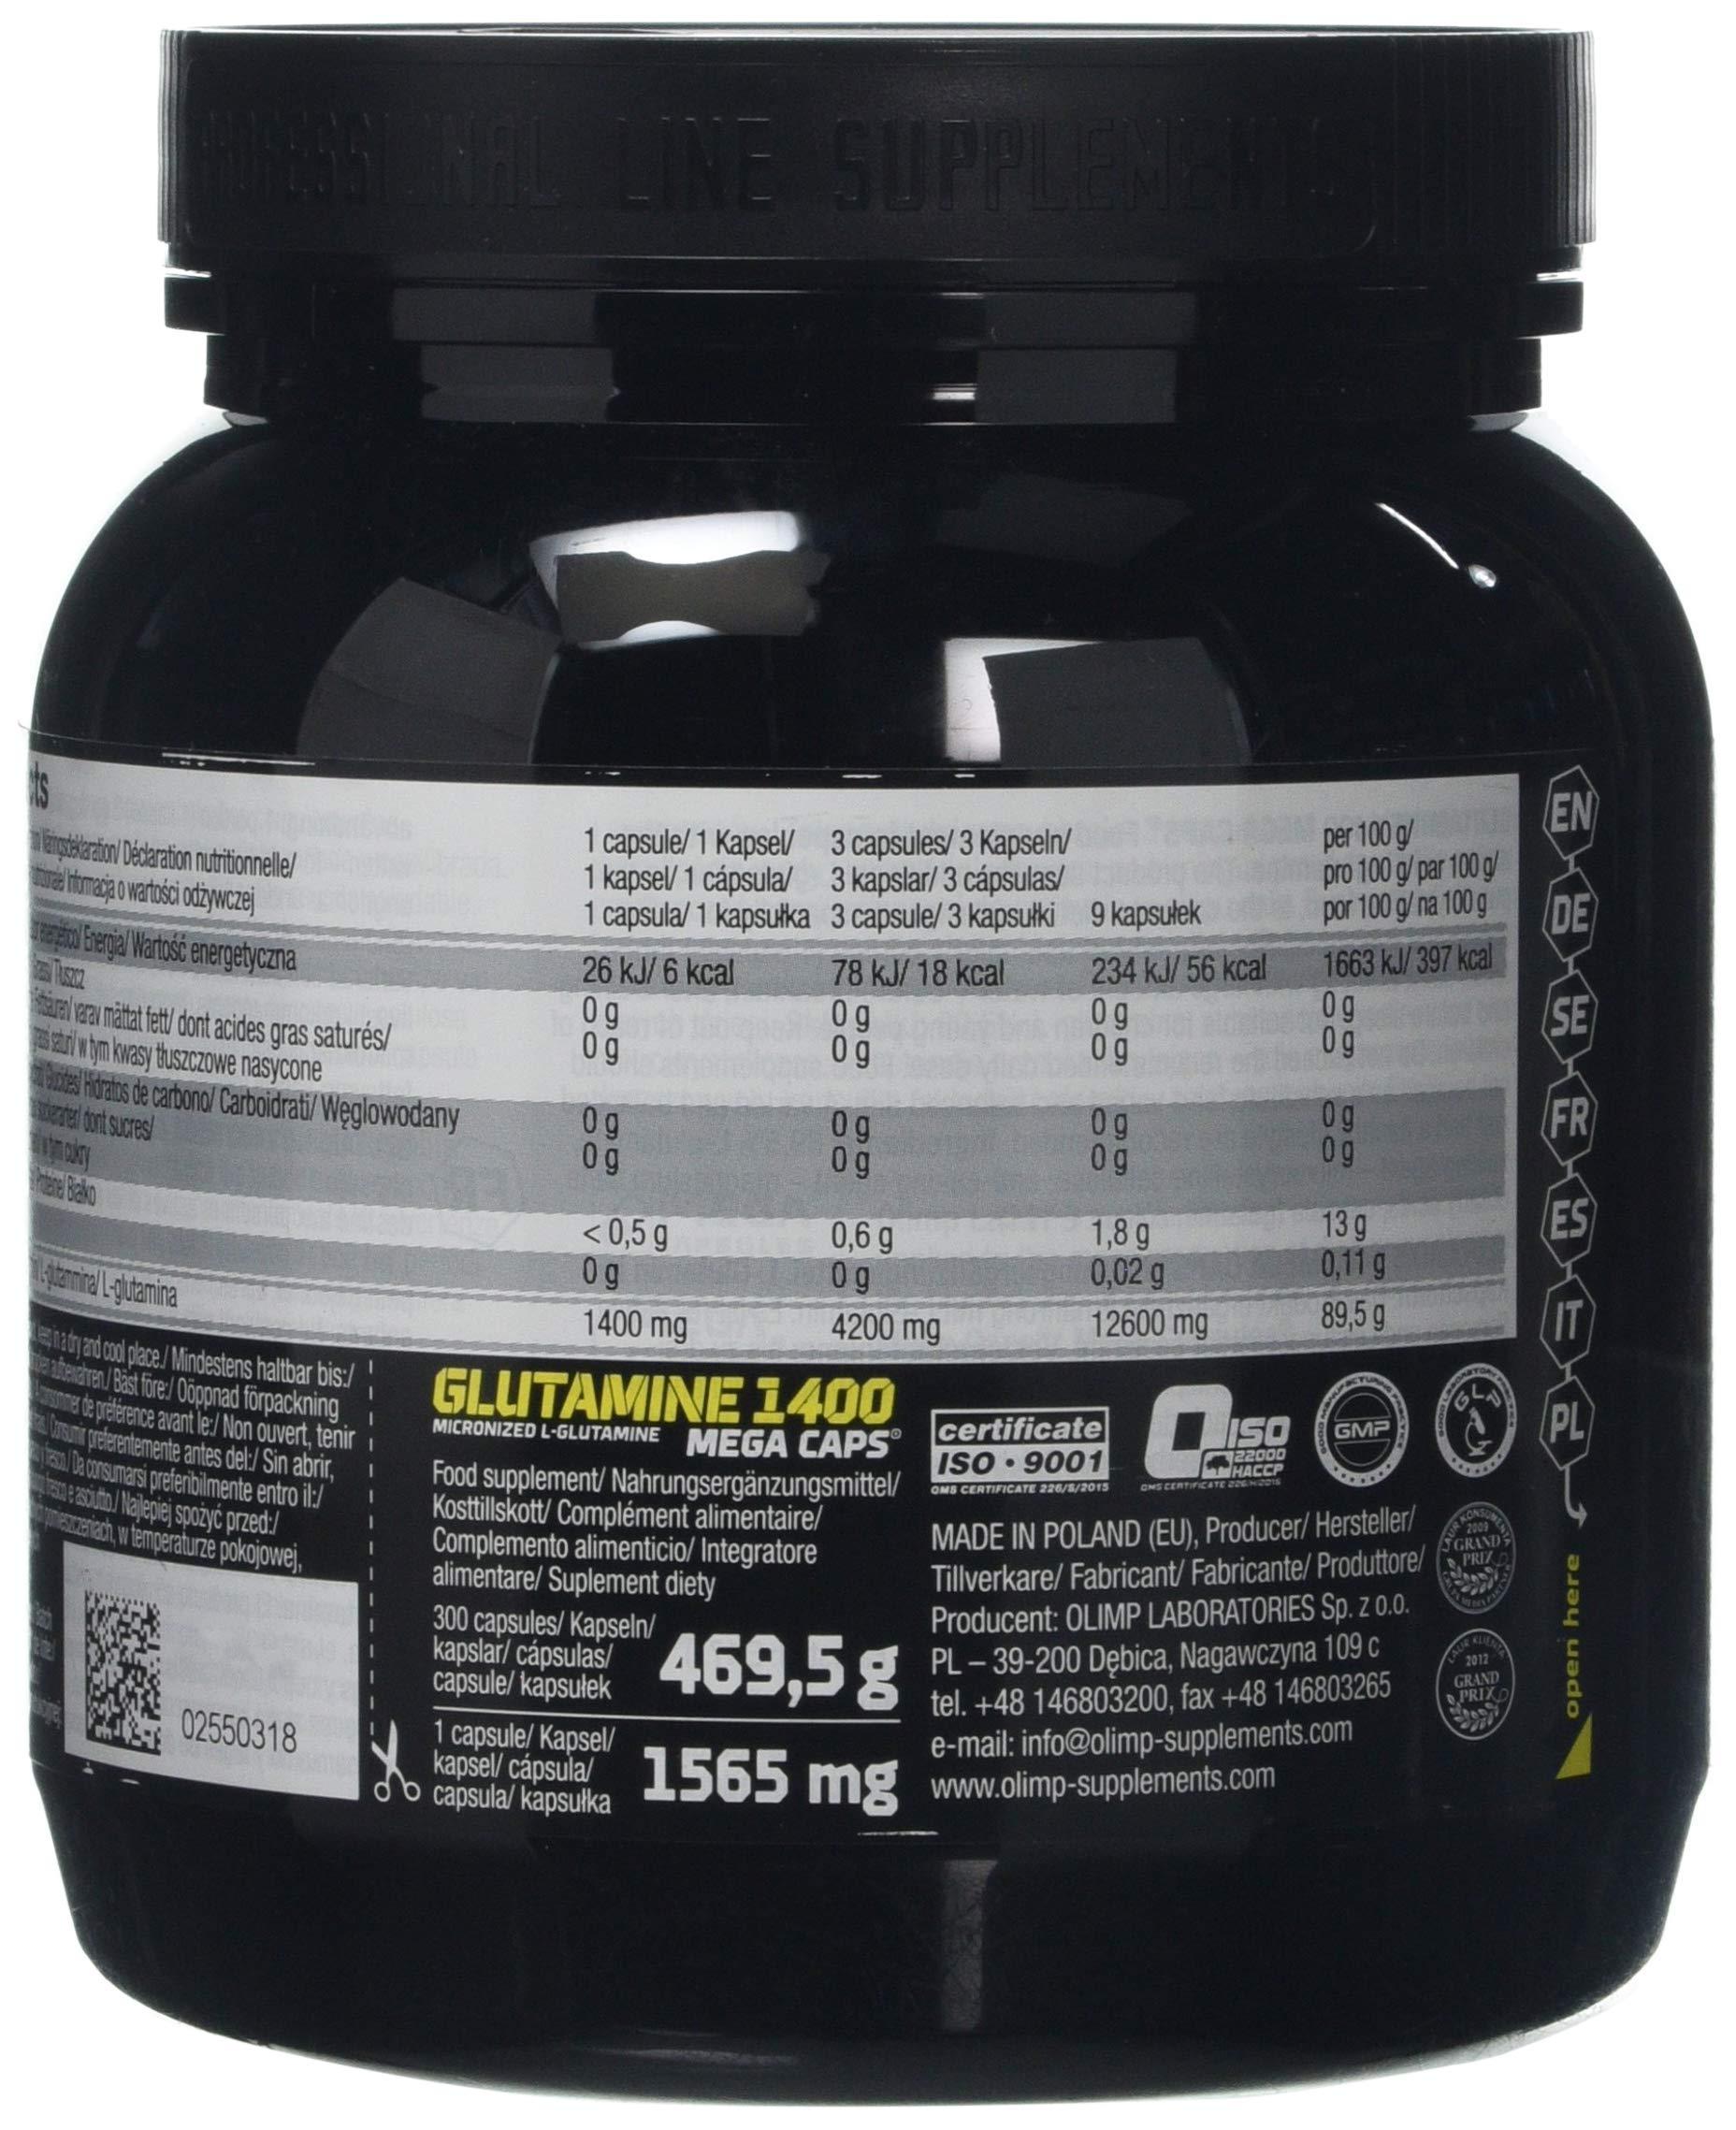 81mSnimVvkL - Olimp Sport Nutrition L-Glutamin Mega Caps-300Caps